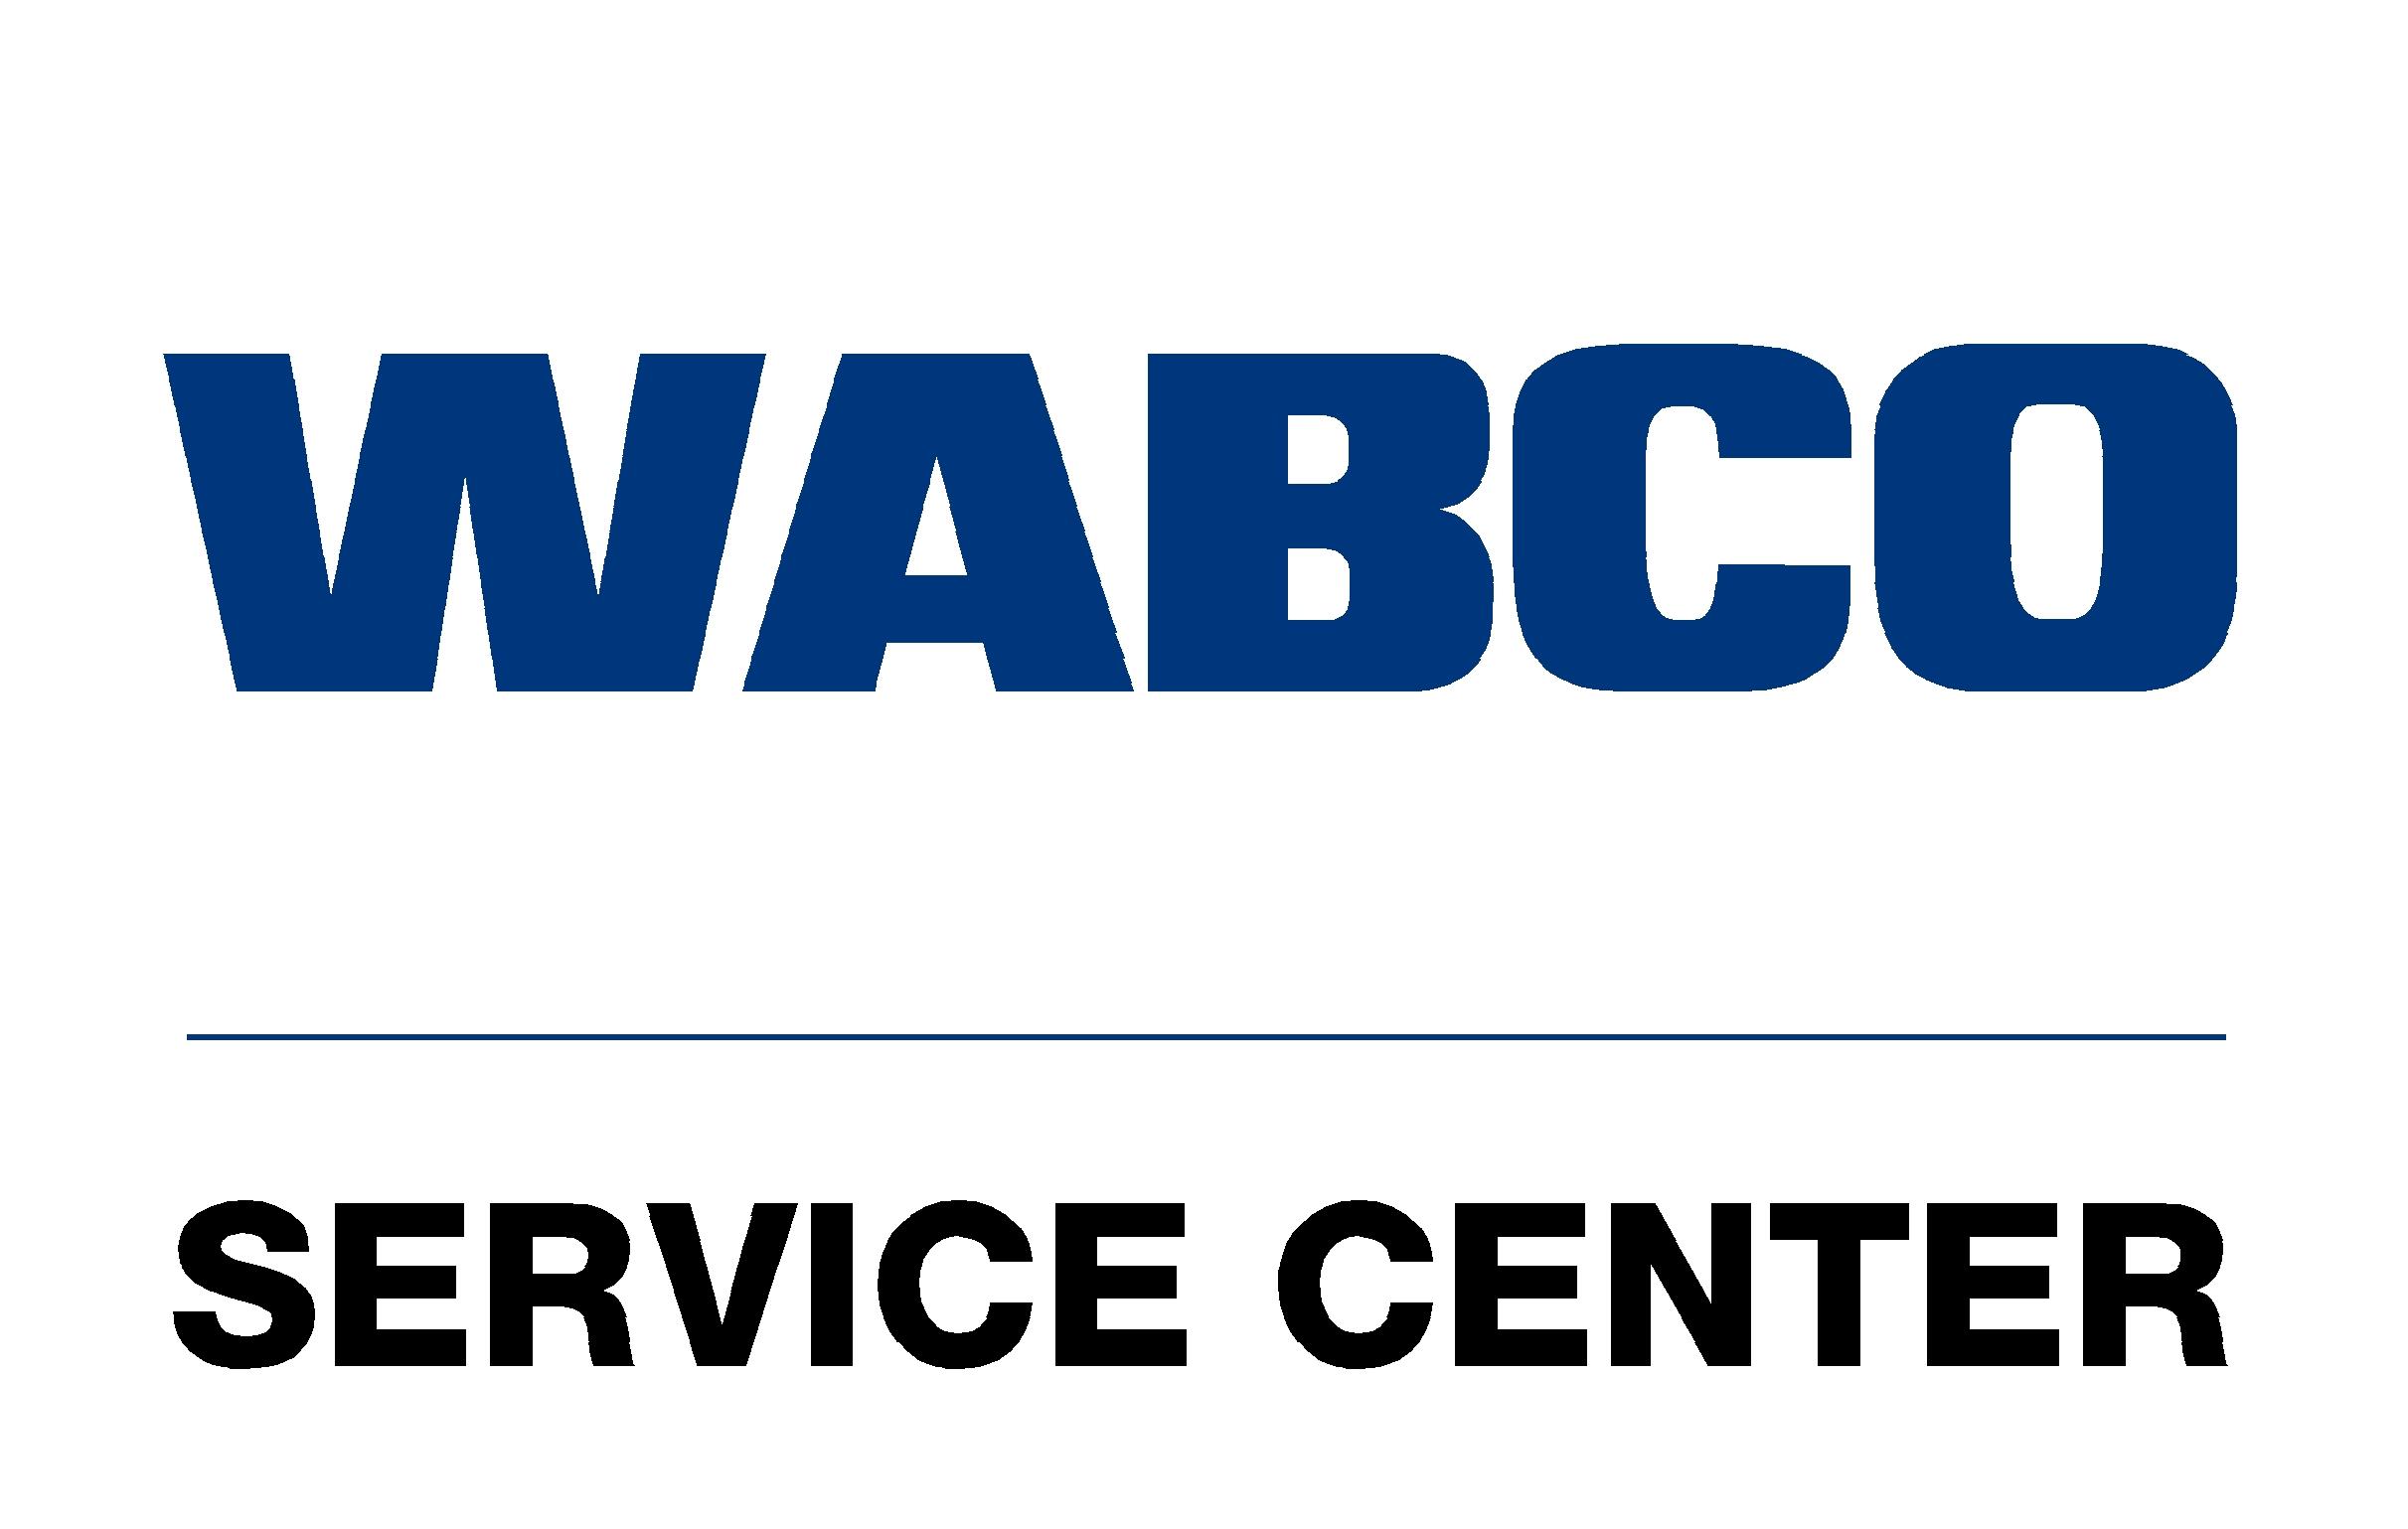 wabco service center 2005